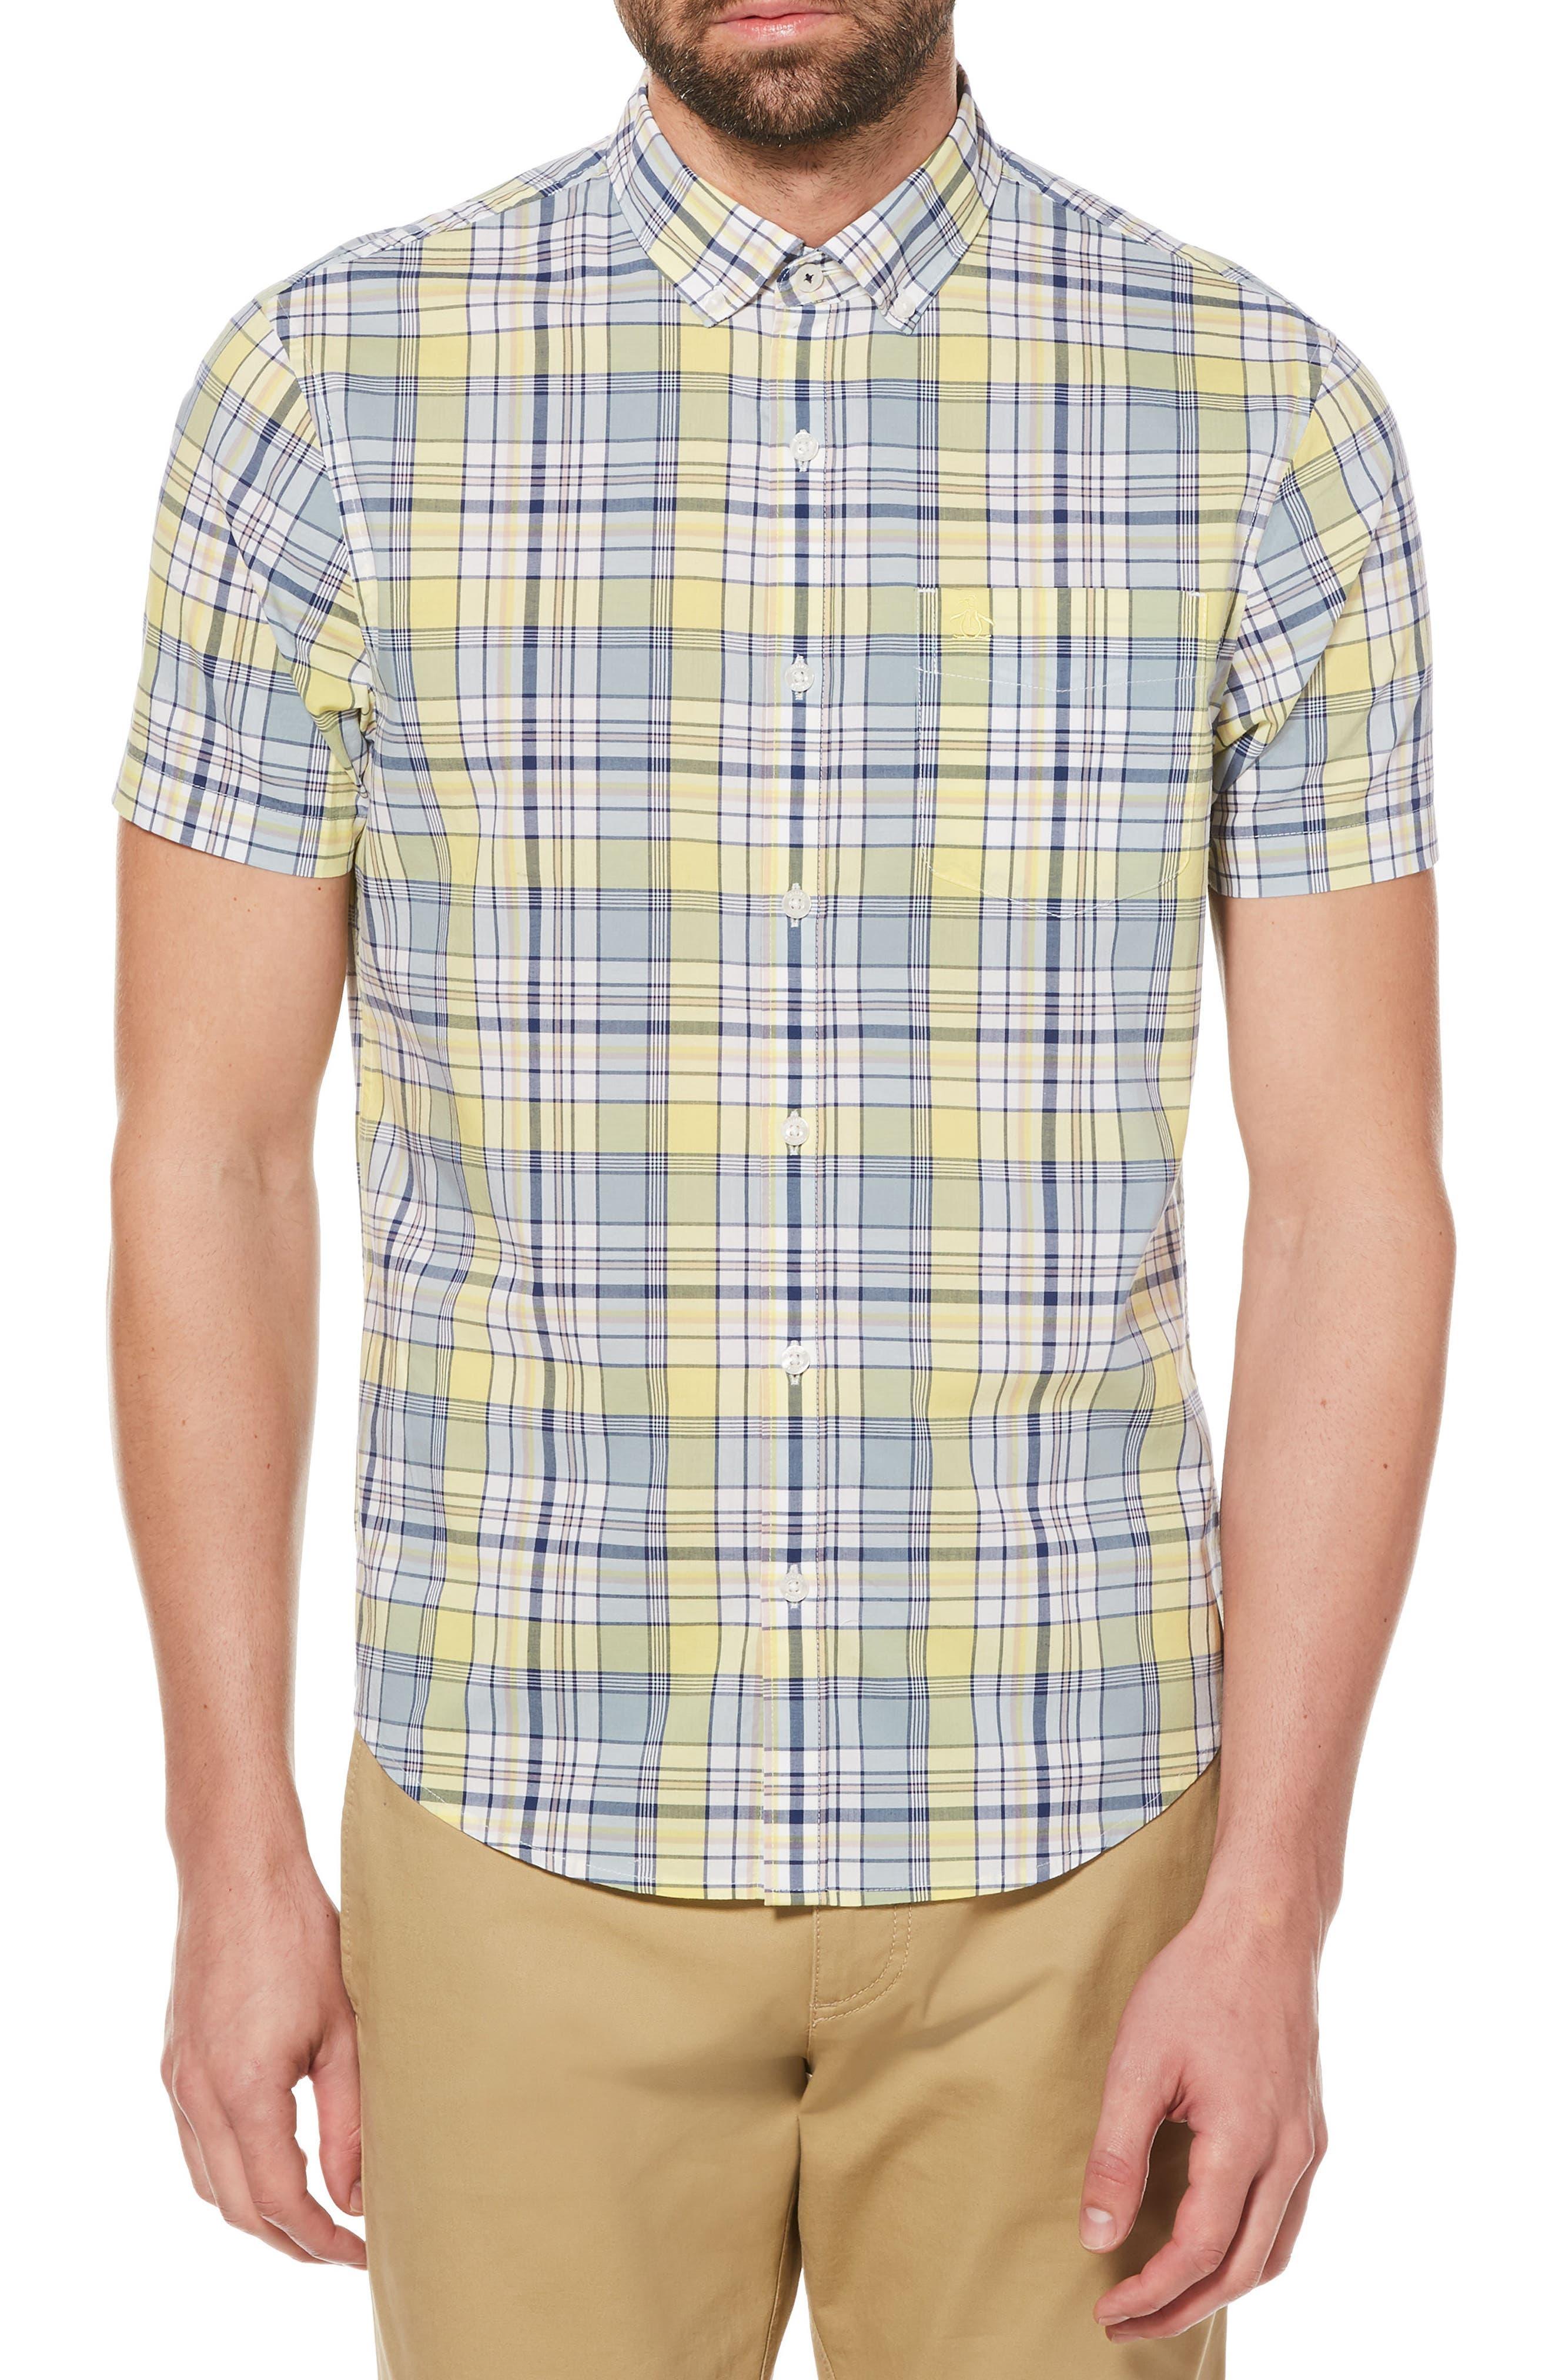 P55 Woven Shirt,                             Main thumbnail 1, color,                             Limelight